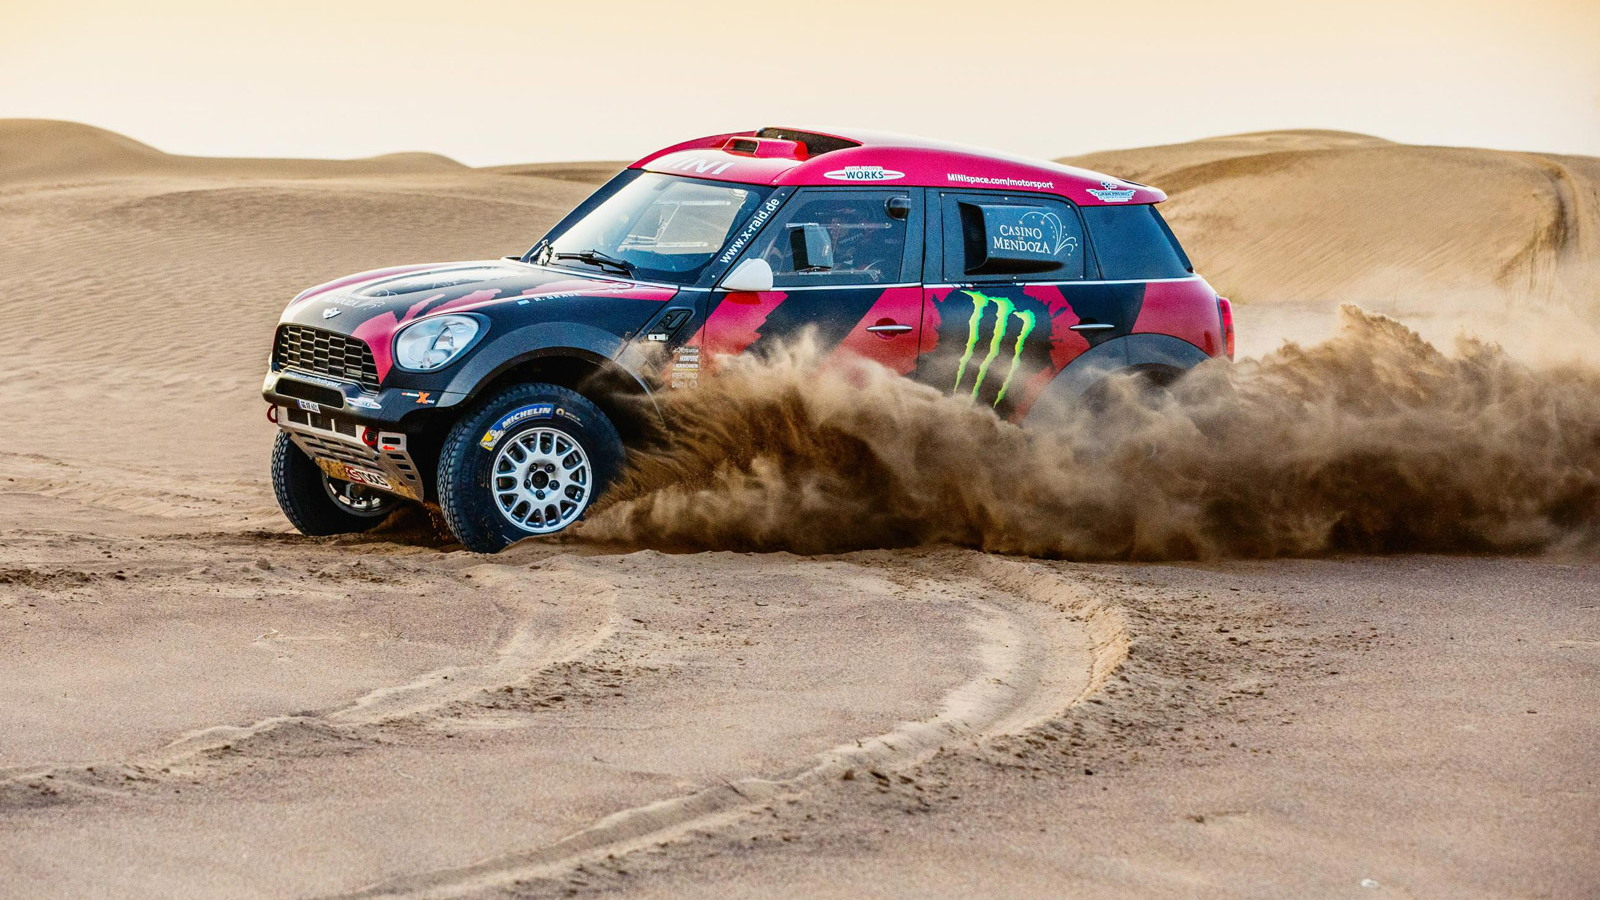 2015 X-Raid MINI All4 Racing